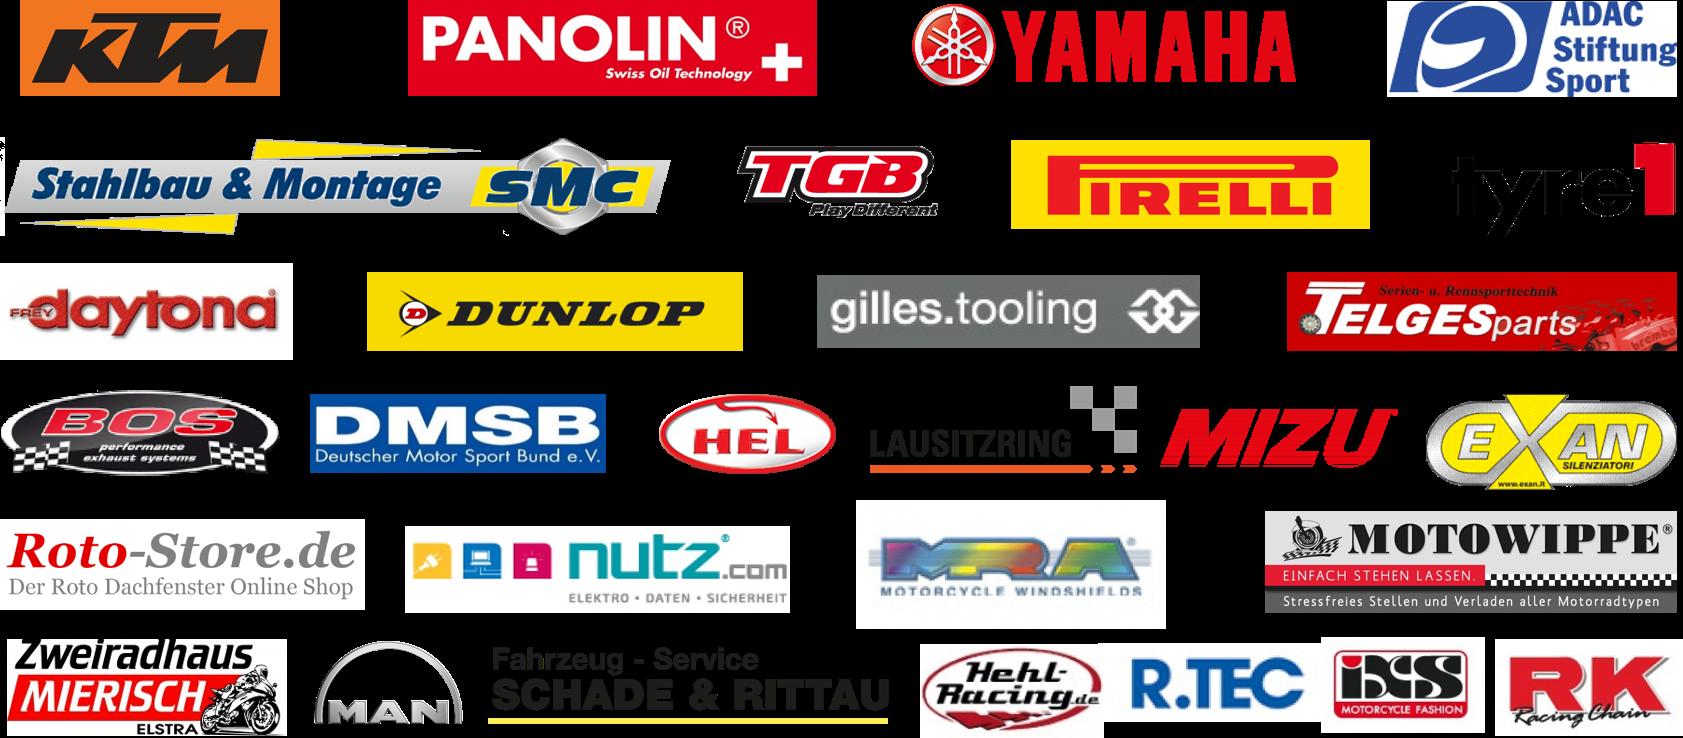 roto-store.de Panolin KTM HEL Gms-motorsport.de gilles tooling